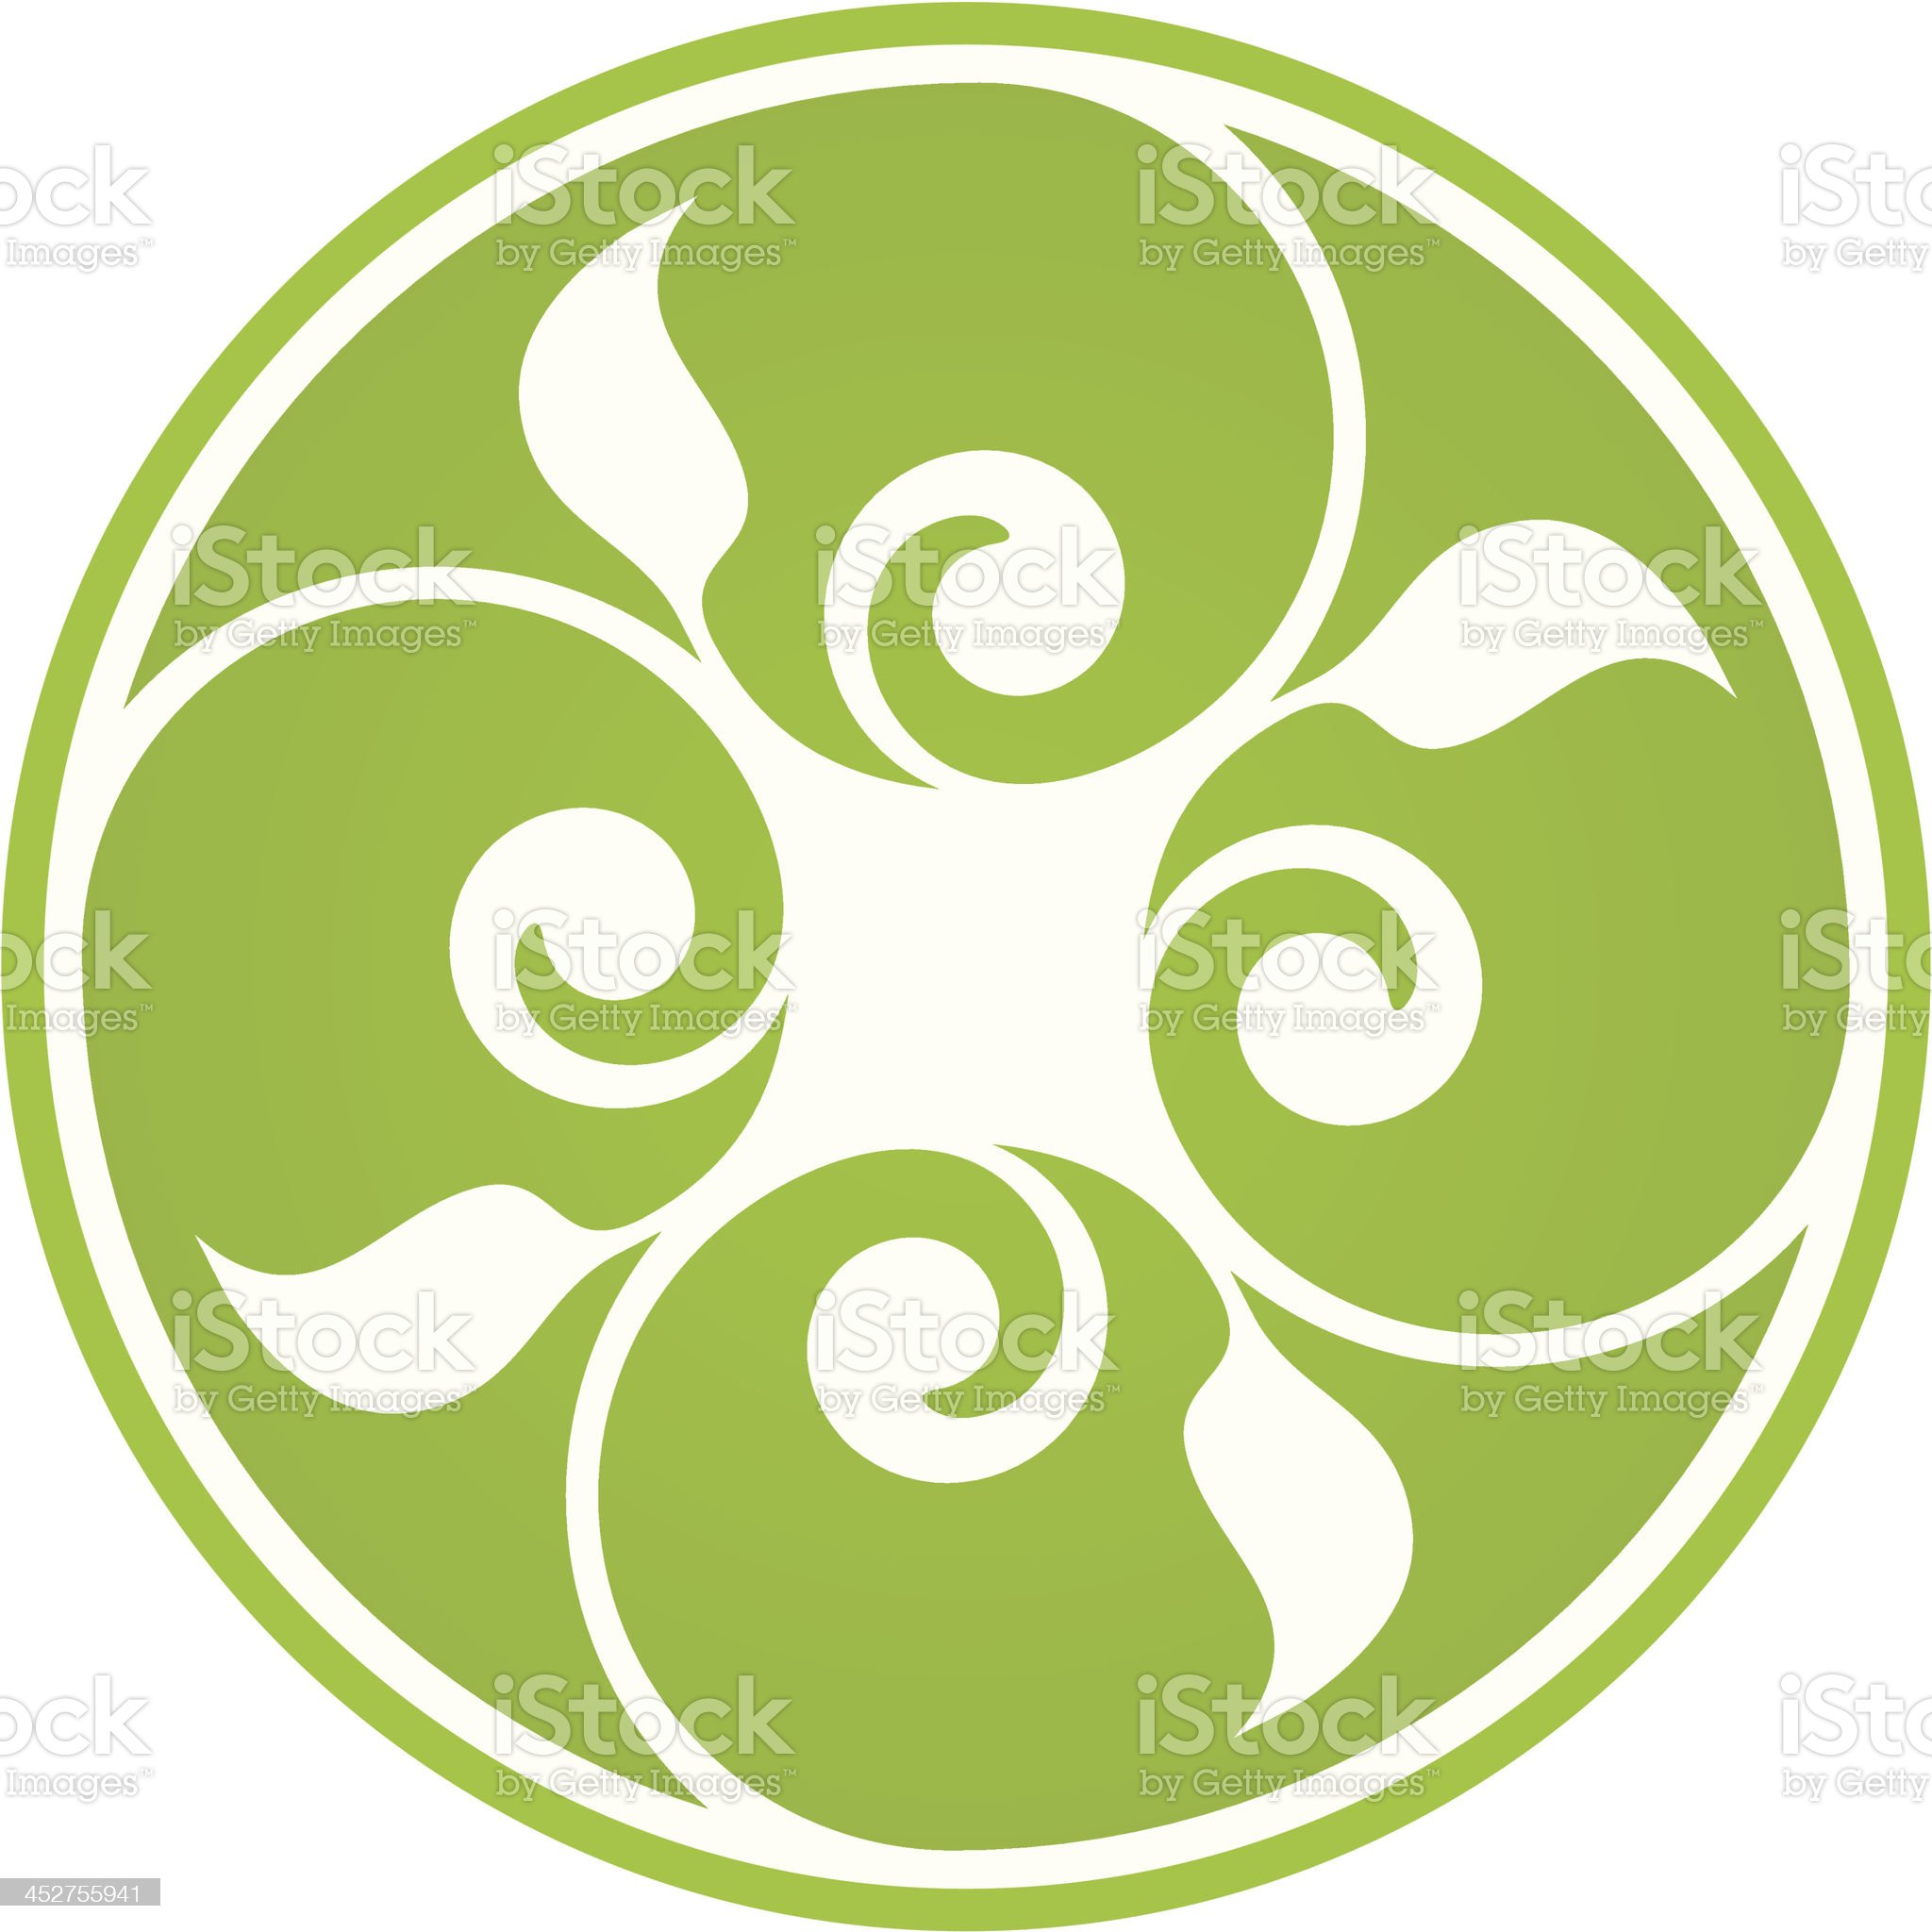 Floral symbol royalty-free stock vector art